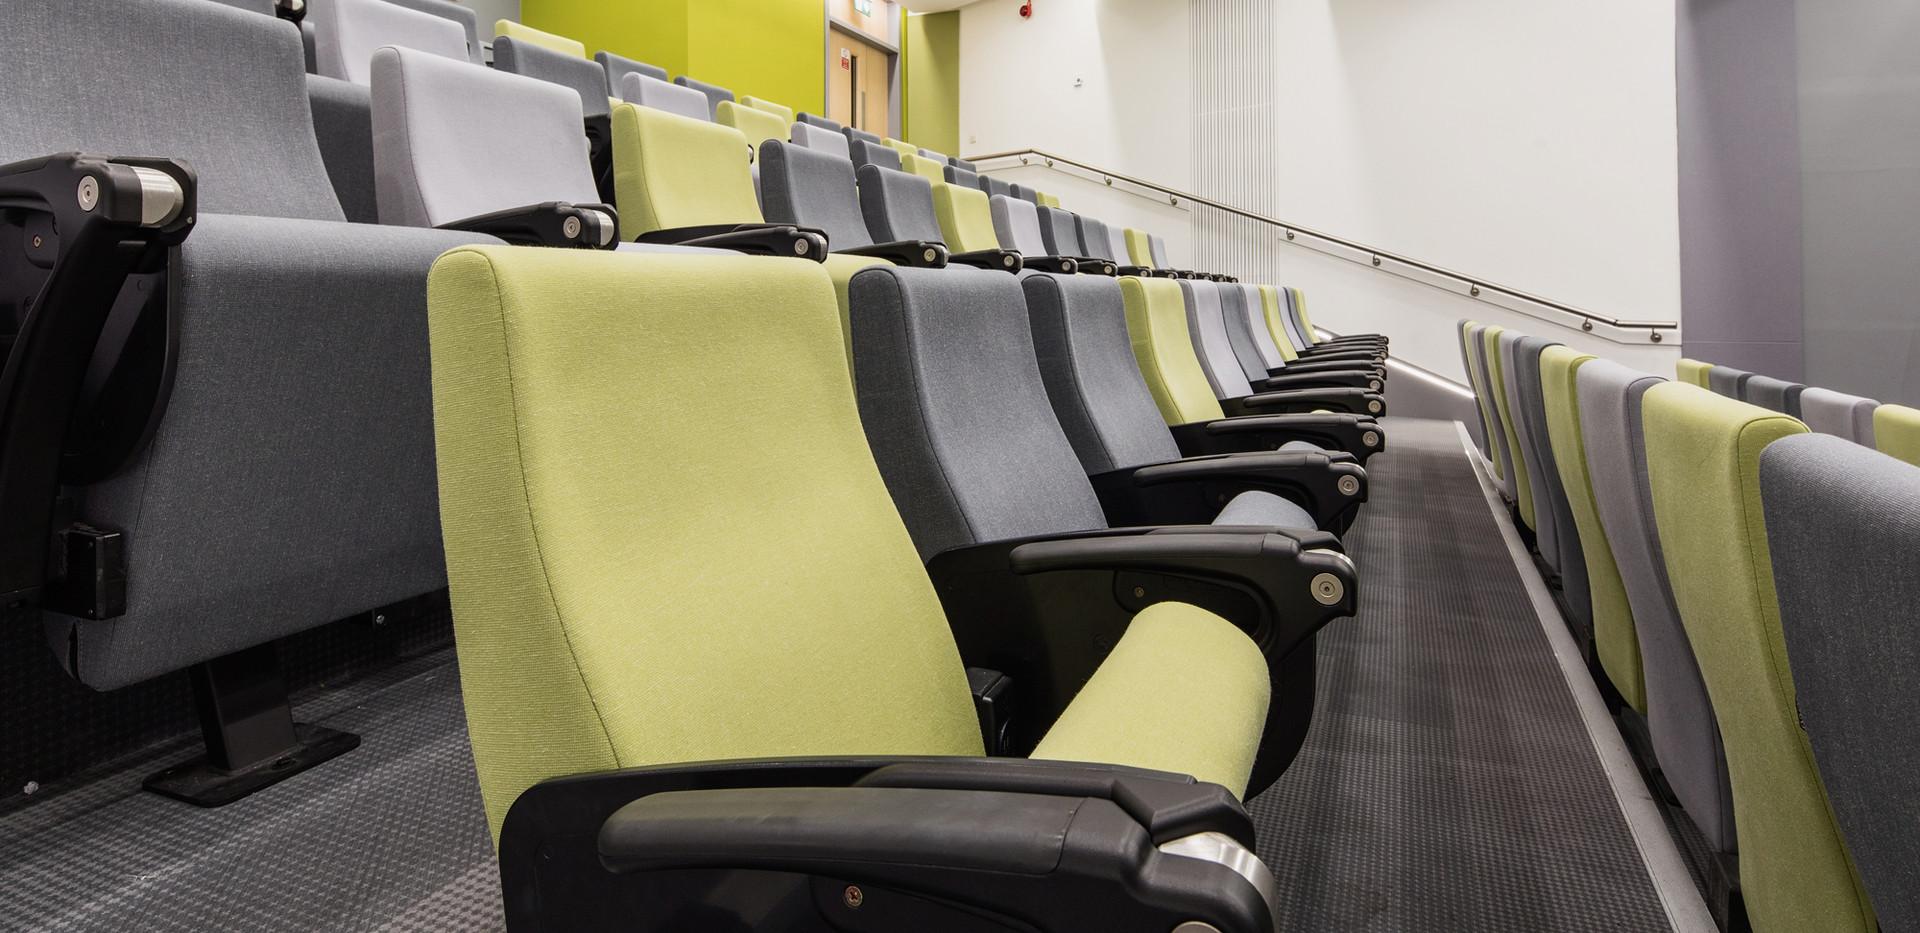 Fernco Chairs Dundee Photography Studio-